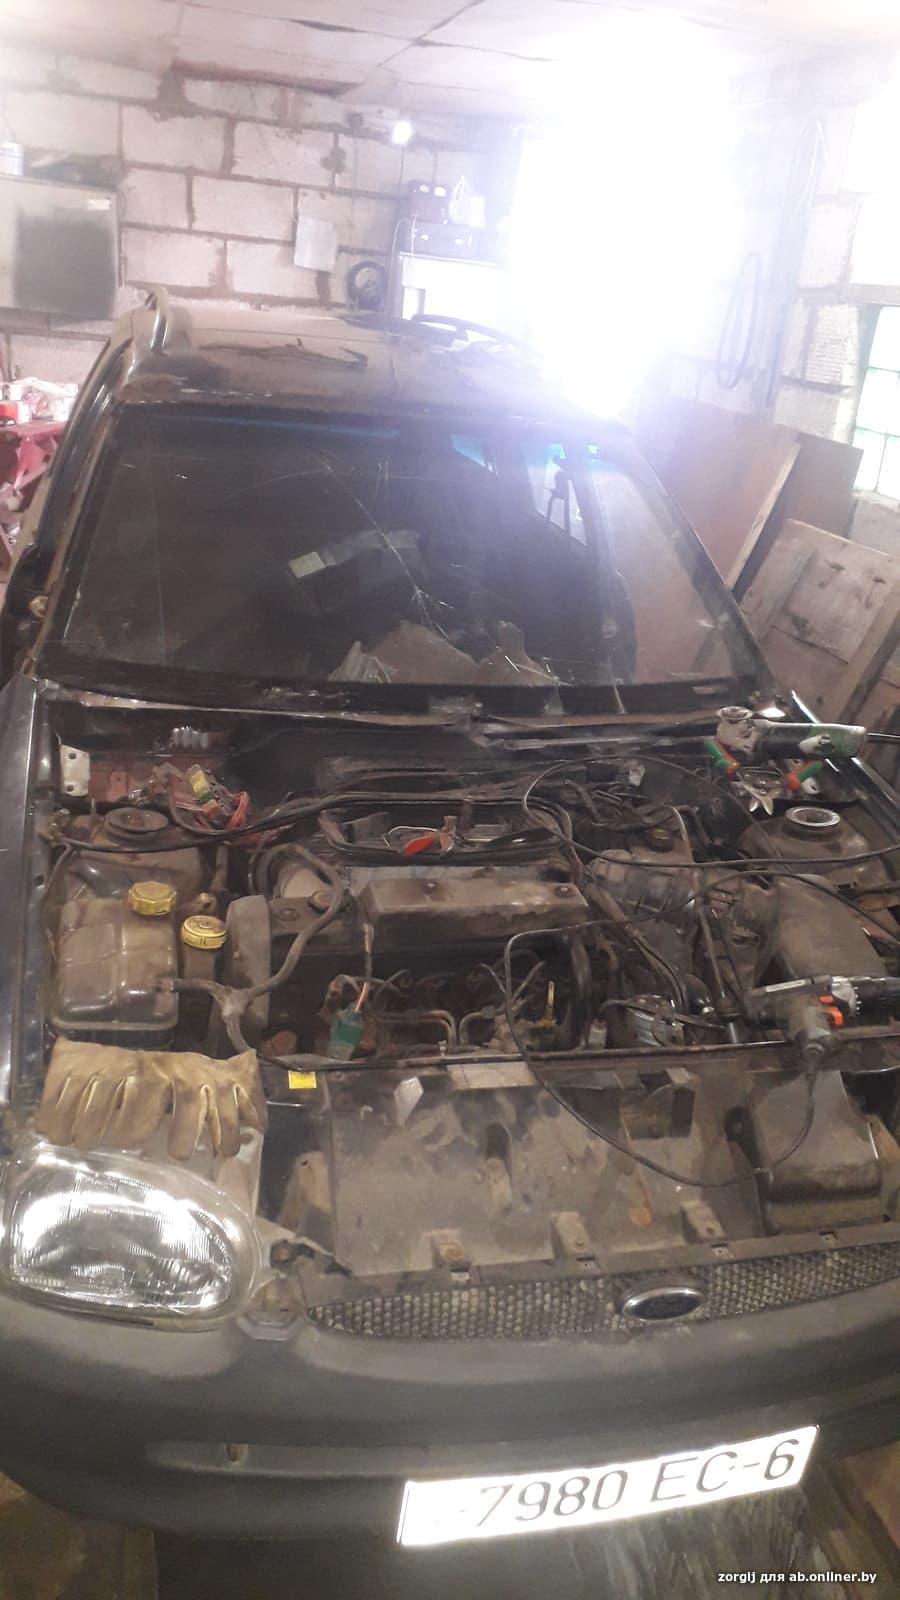 Ford Escort TDI